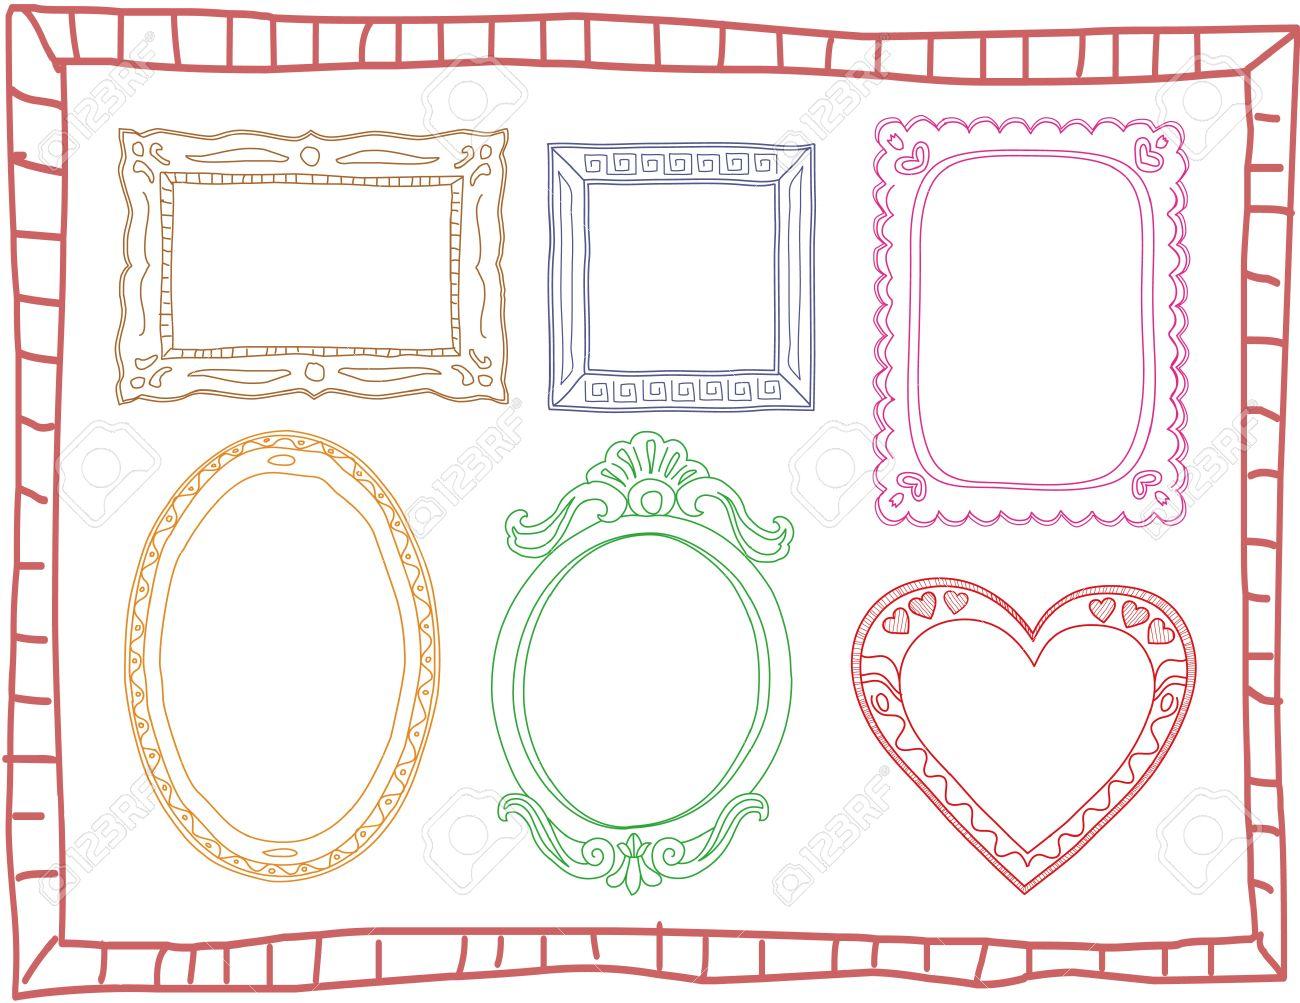 Set of hand-drawn colorful doodle frames - 15305658